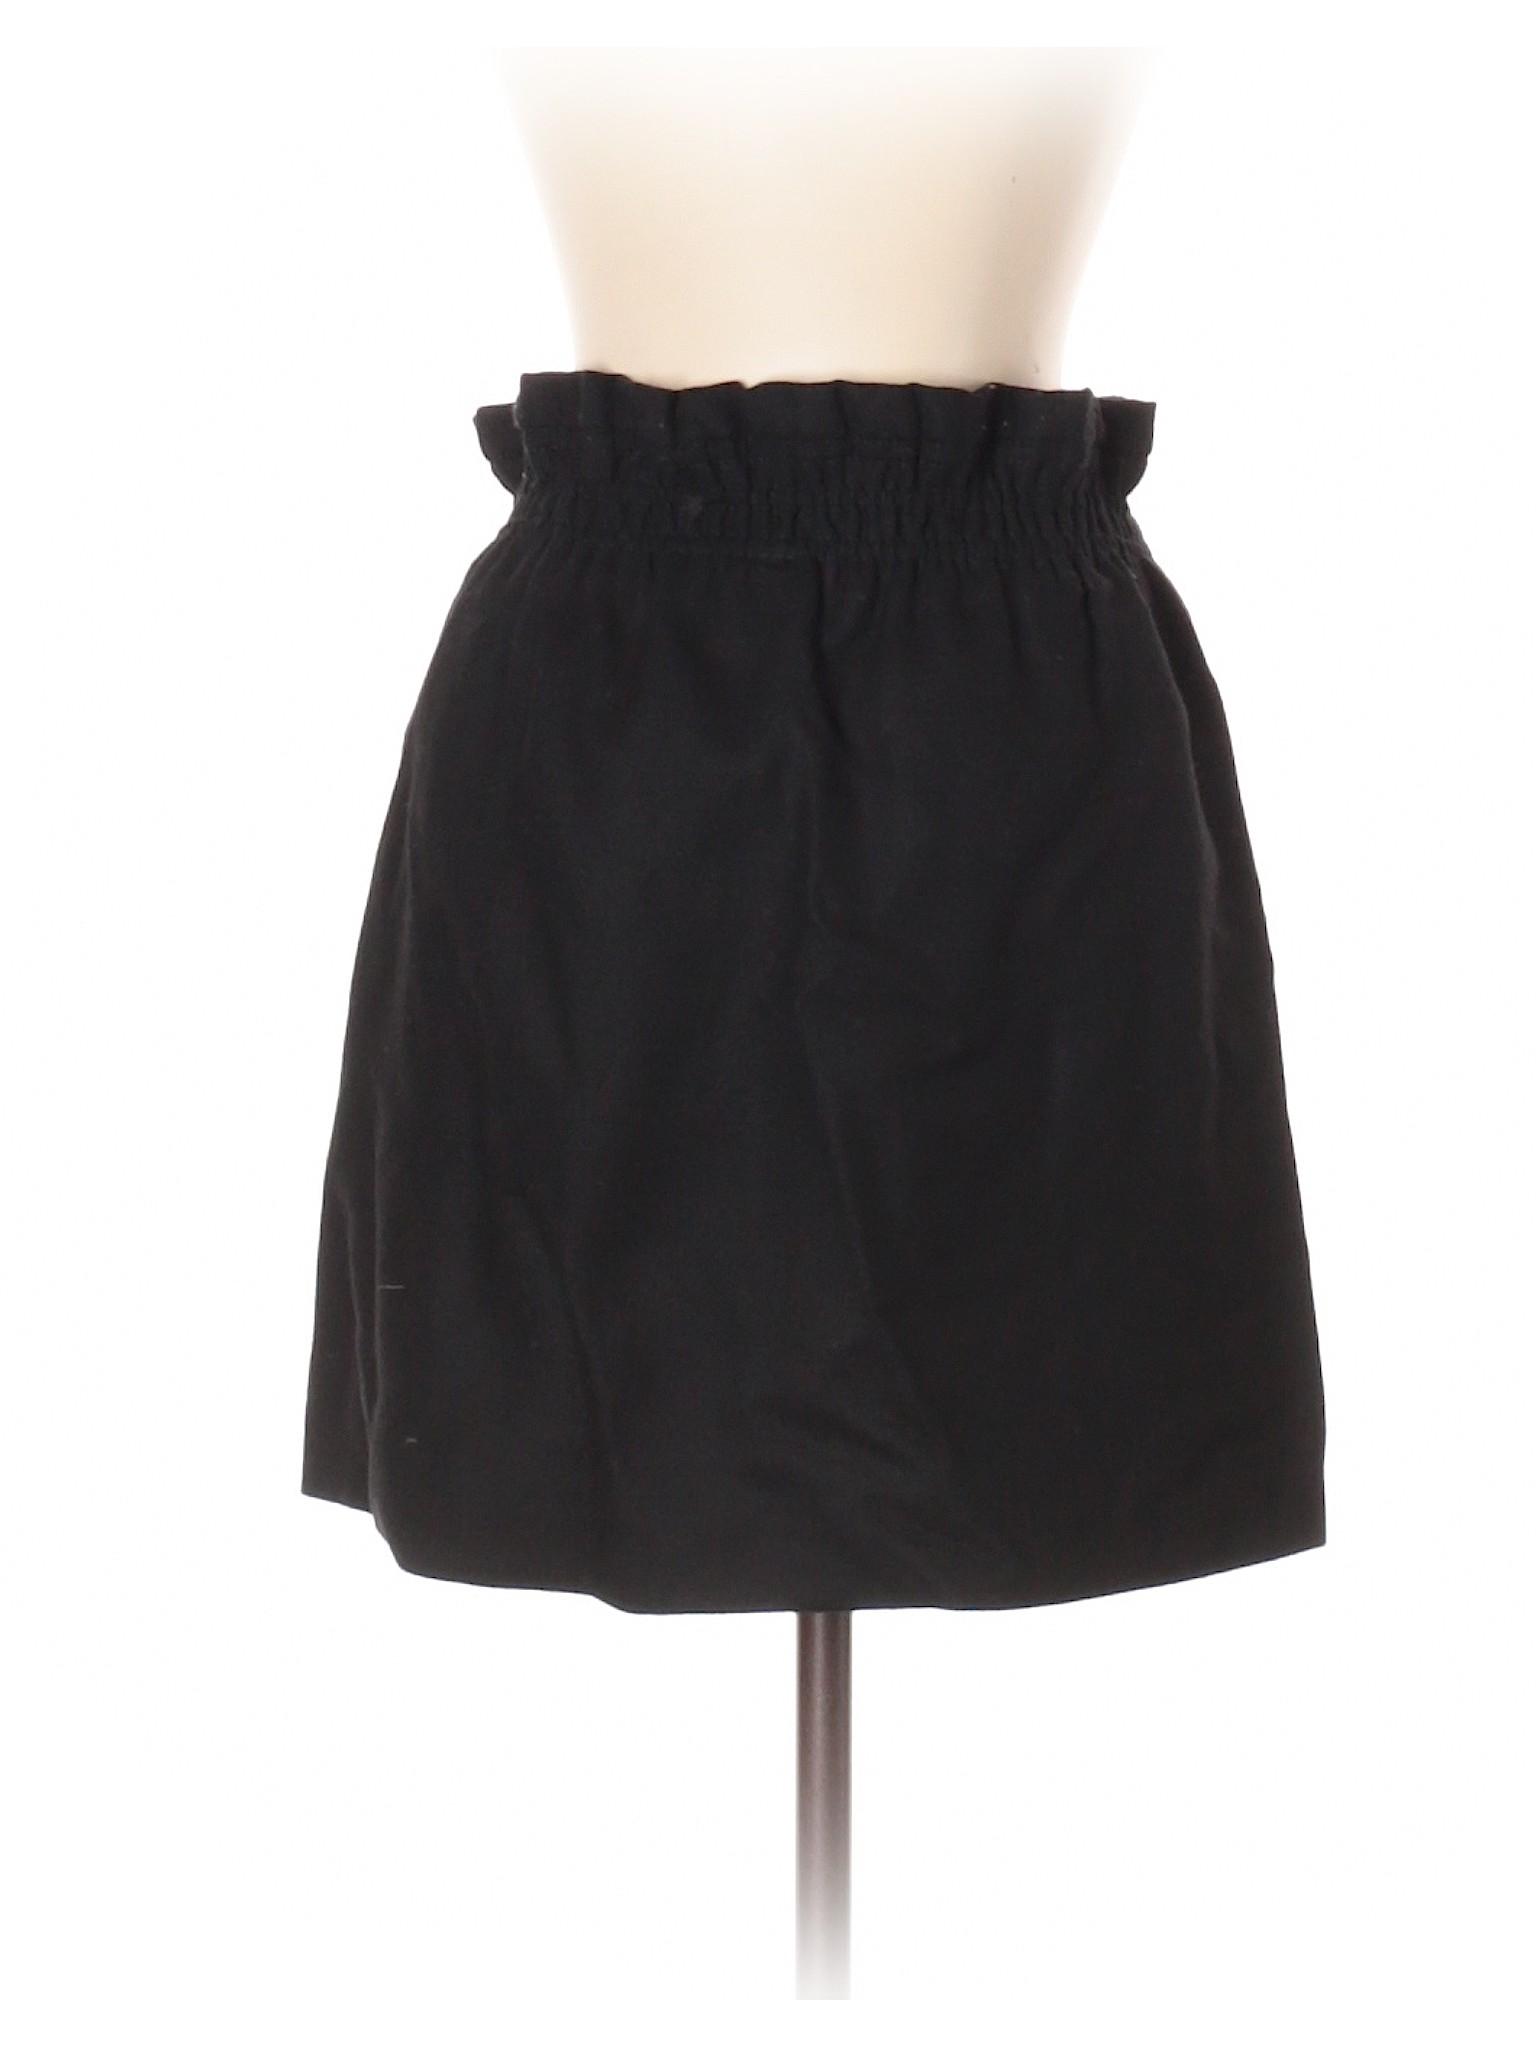 Skirt Wool Skirt Boutique Skirt Boutique Boutique Wool Wool Wool Boutique Skirt Boutique WfqWwZ0C